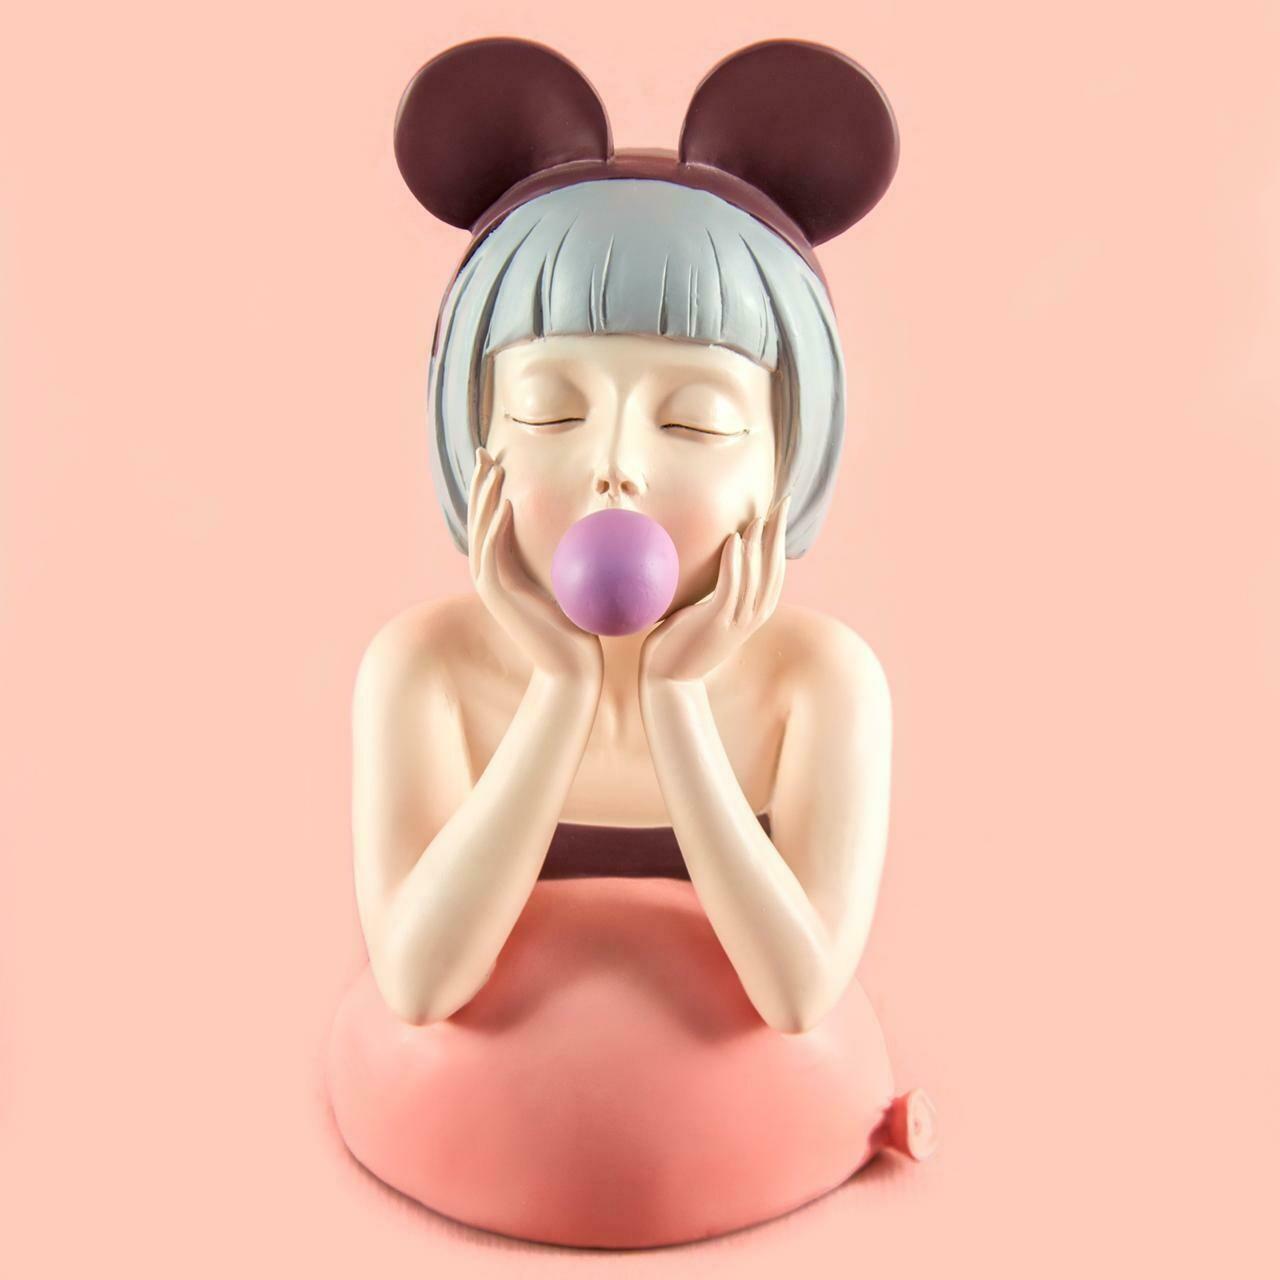 Cute Violet Bubble Girl - Cool Ornaments